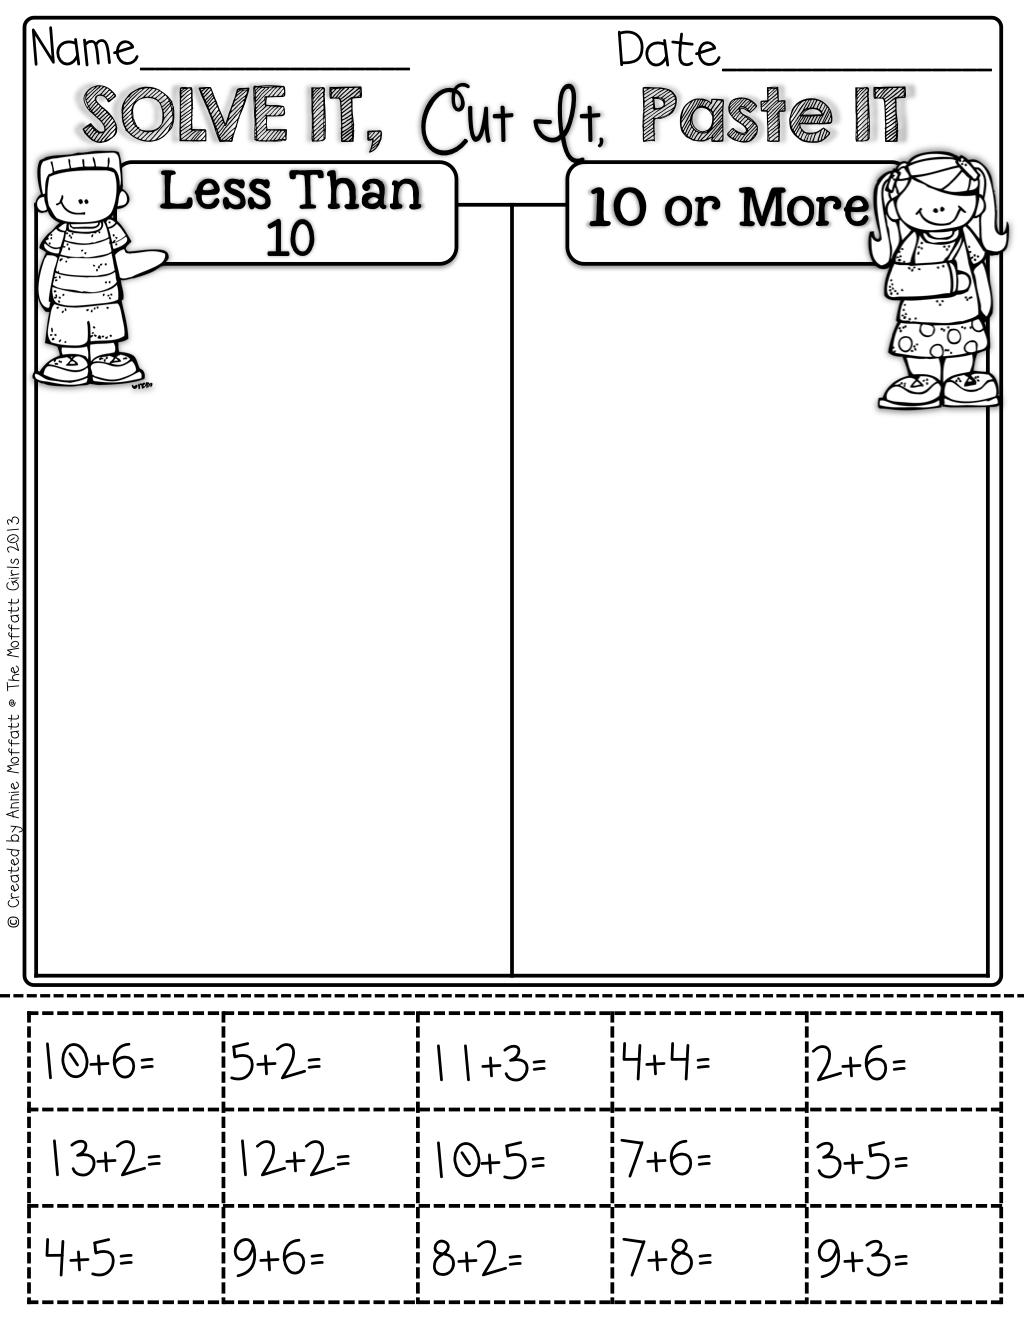 Solve it, cut it, paste it, sort it! First GradeMath